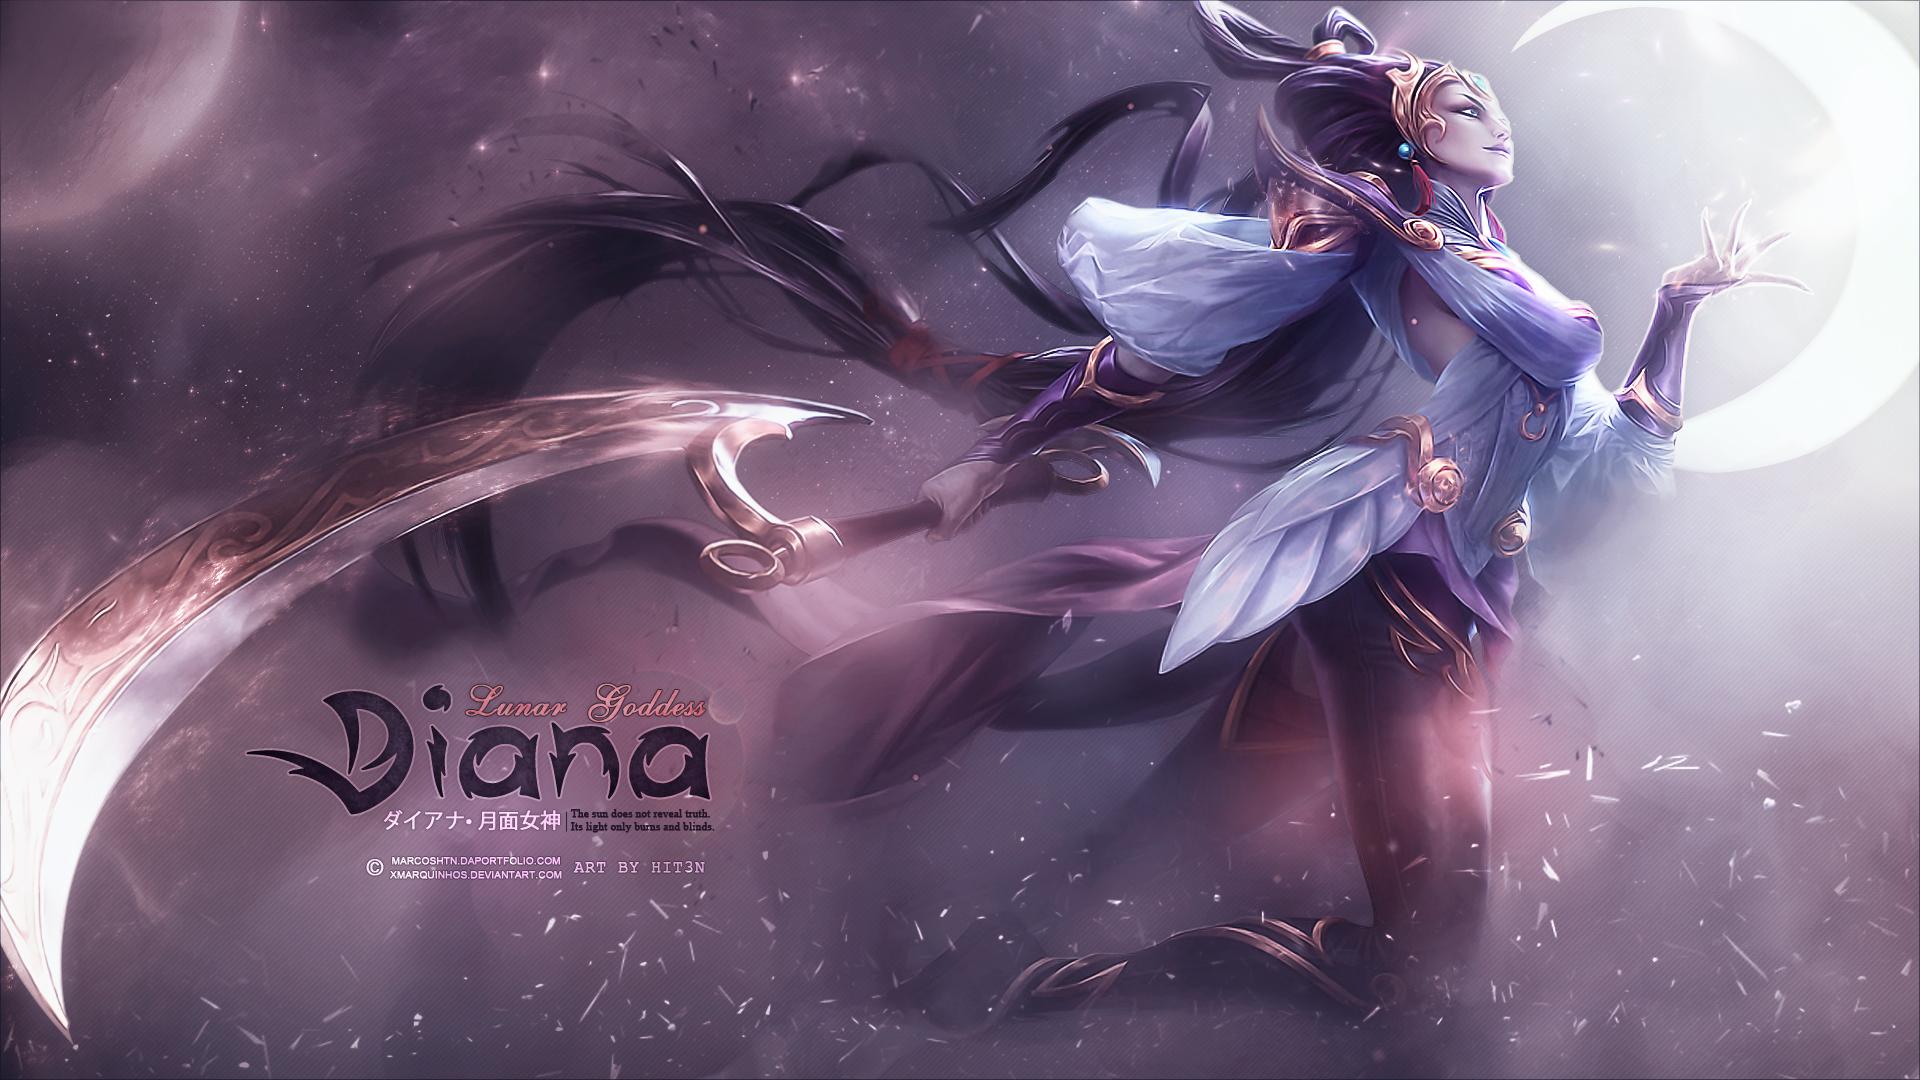 Lunar Goddess Diana - Custom Wallpaper ~ by hit3N by xMarquinhos